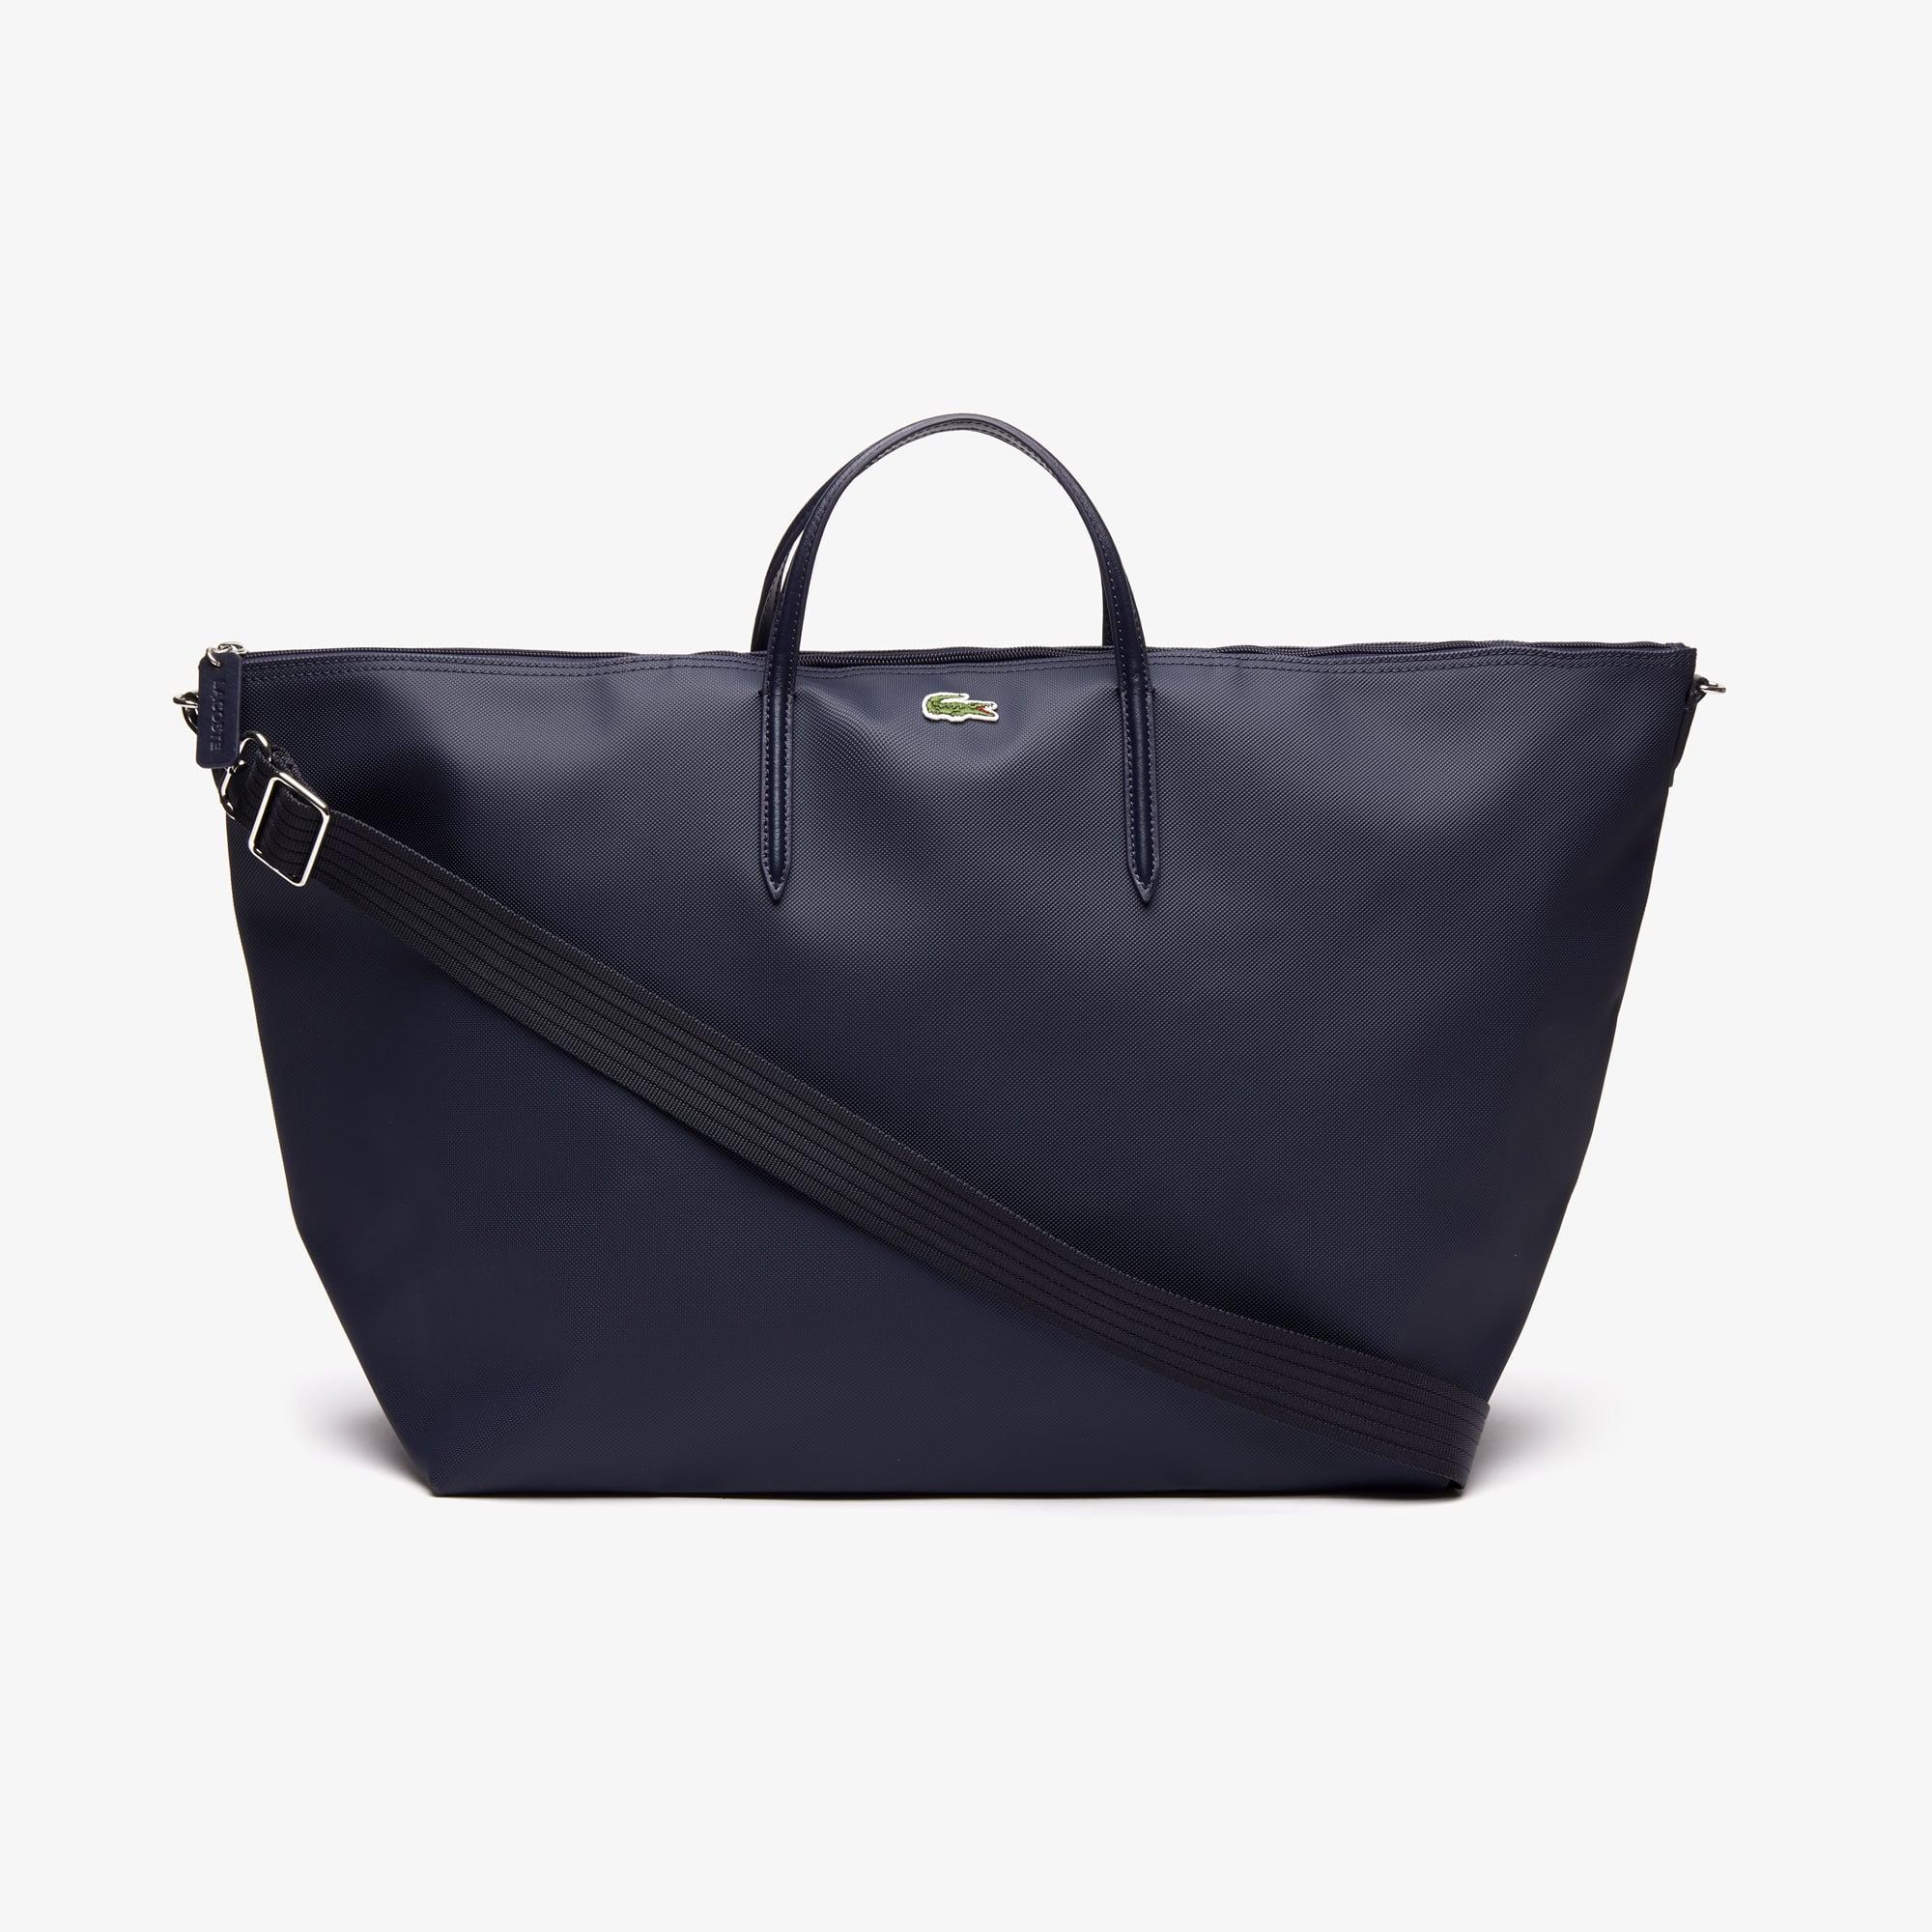 Damen L.12.12 Concept Weekend Tote Bag